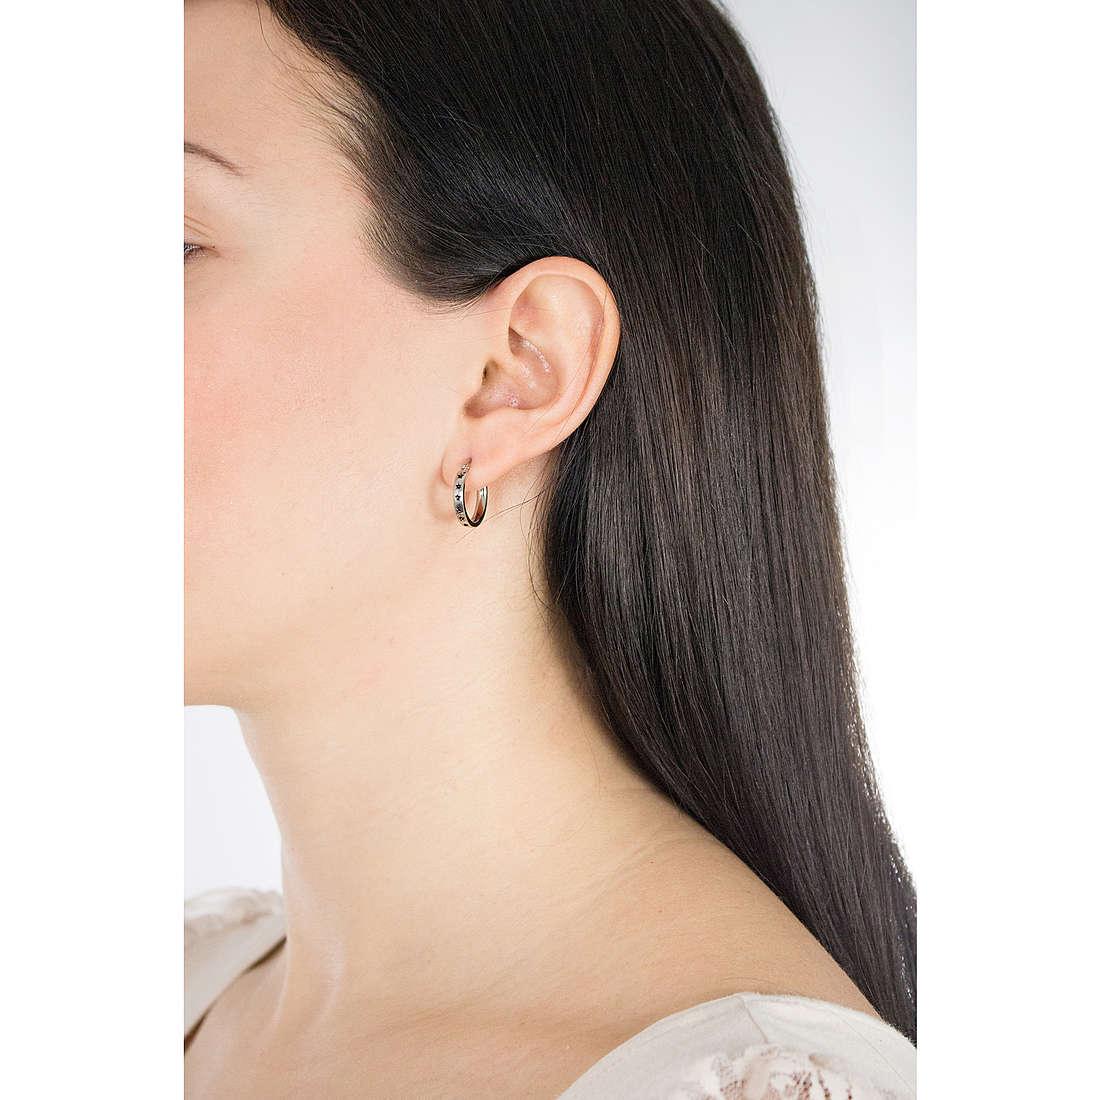 Nomination boucles d'oreille Starlight femme 131509/007 photo wearing